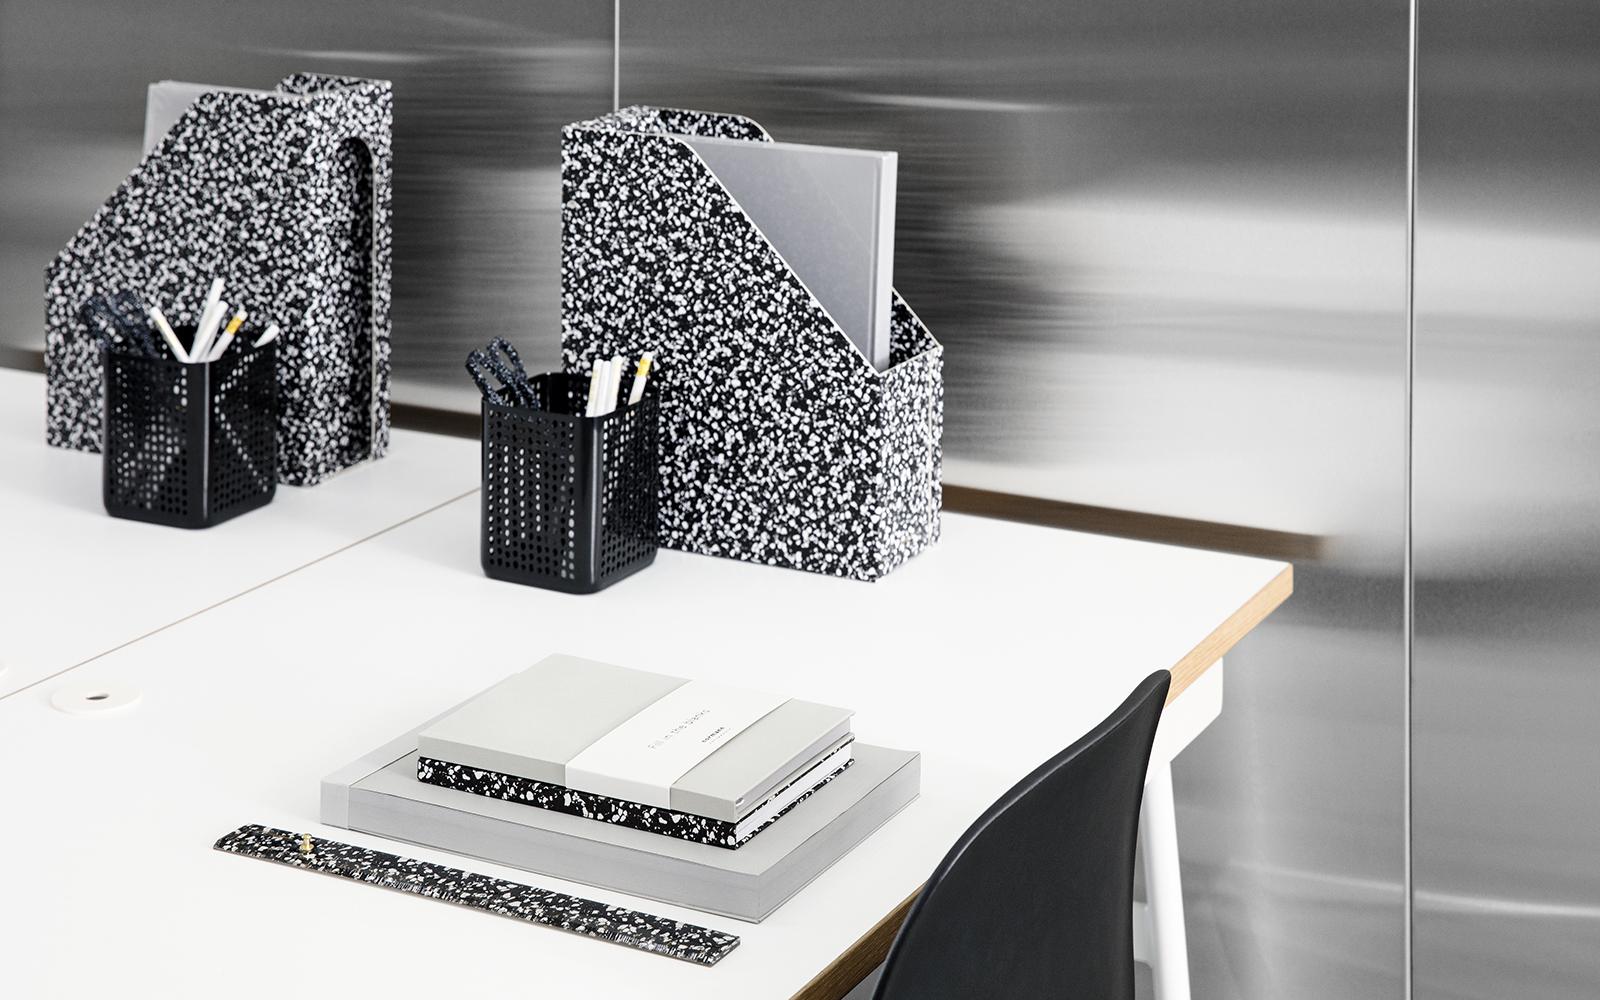 Normann copenhagen journal stories and interior trends for Office design journal